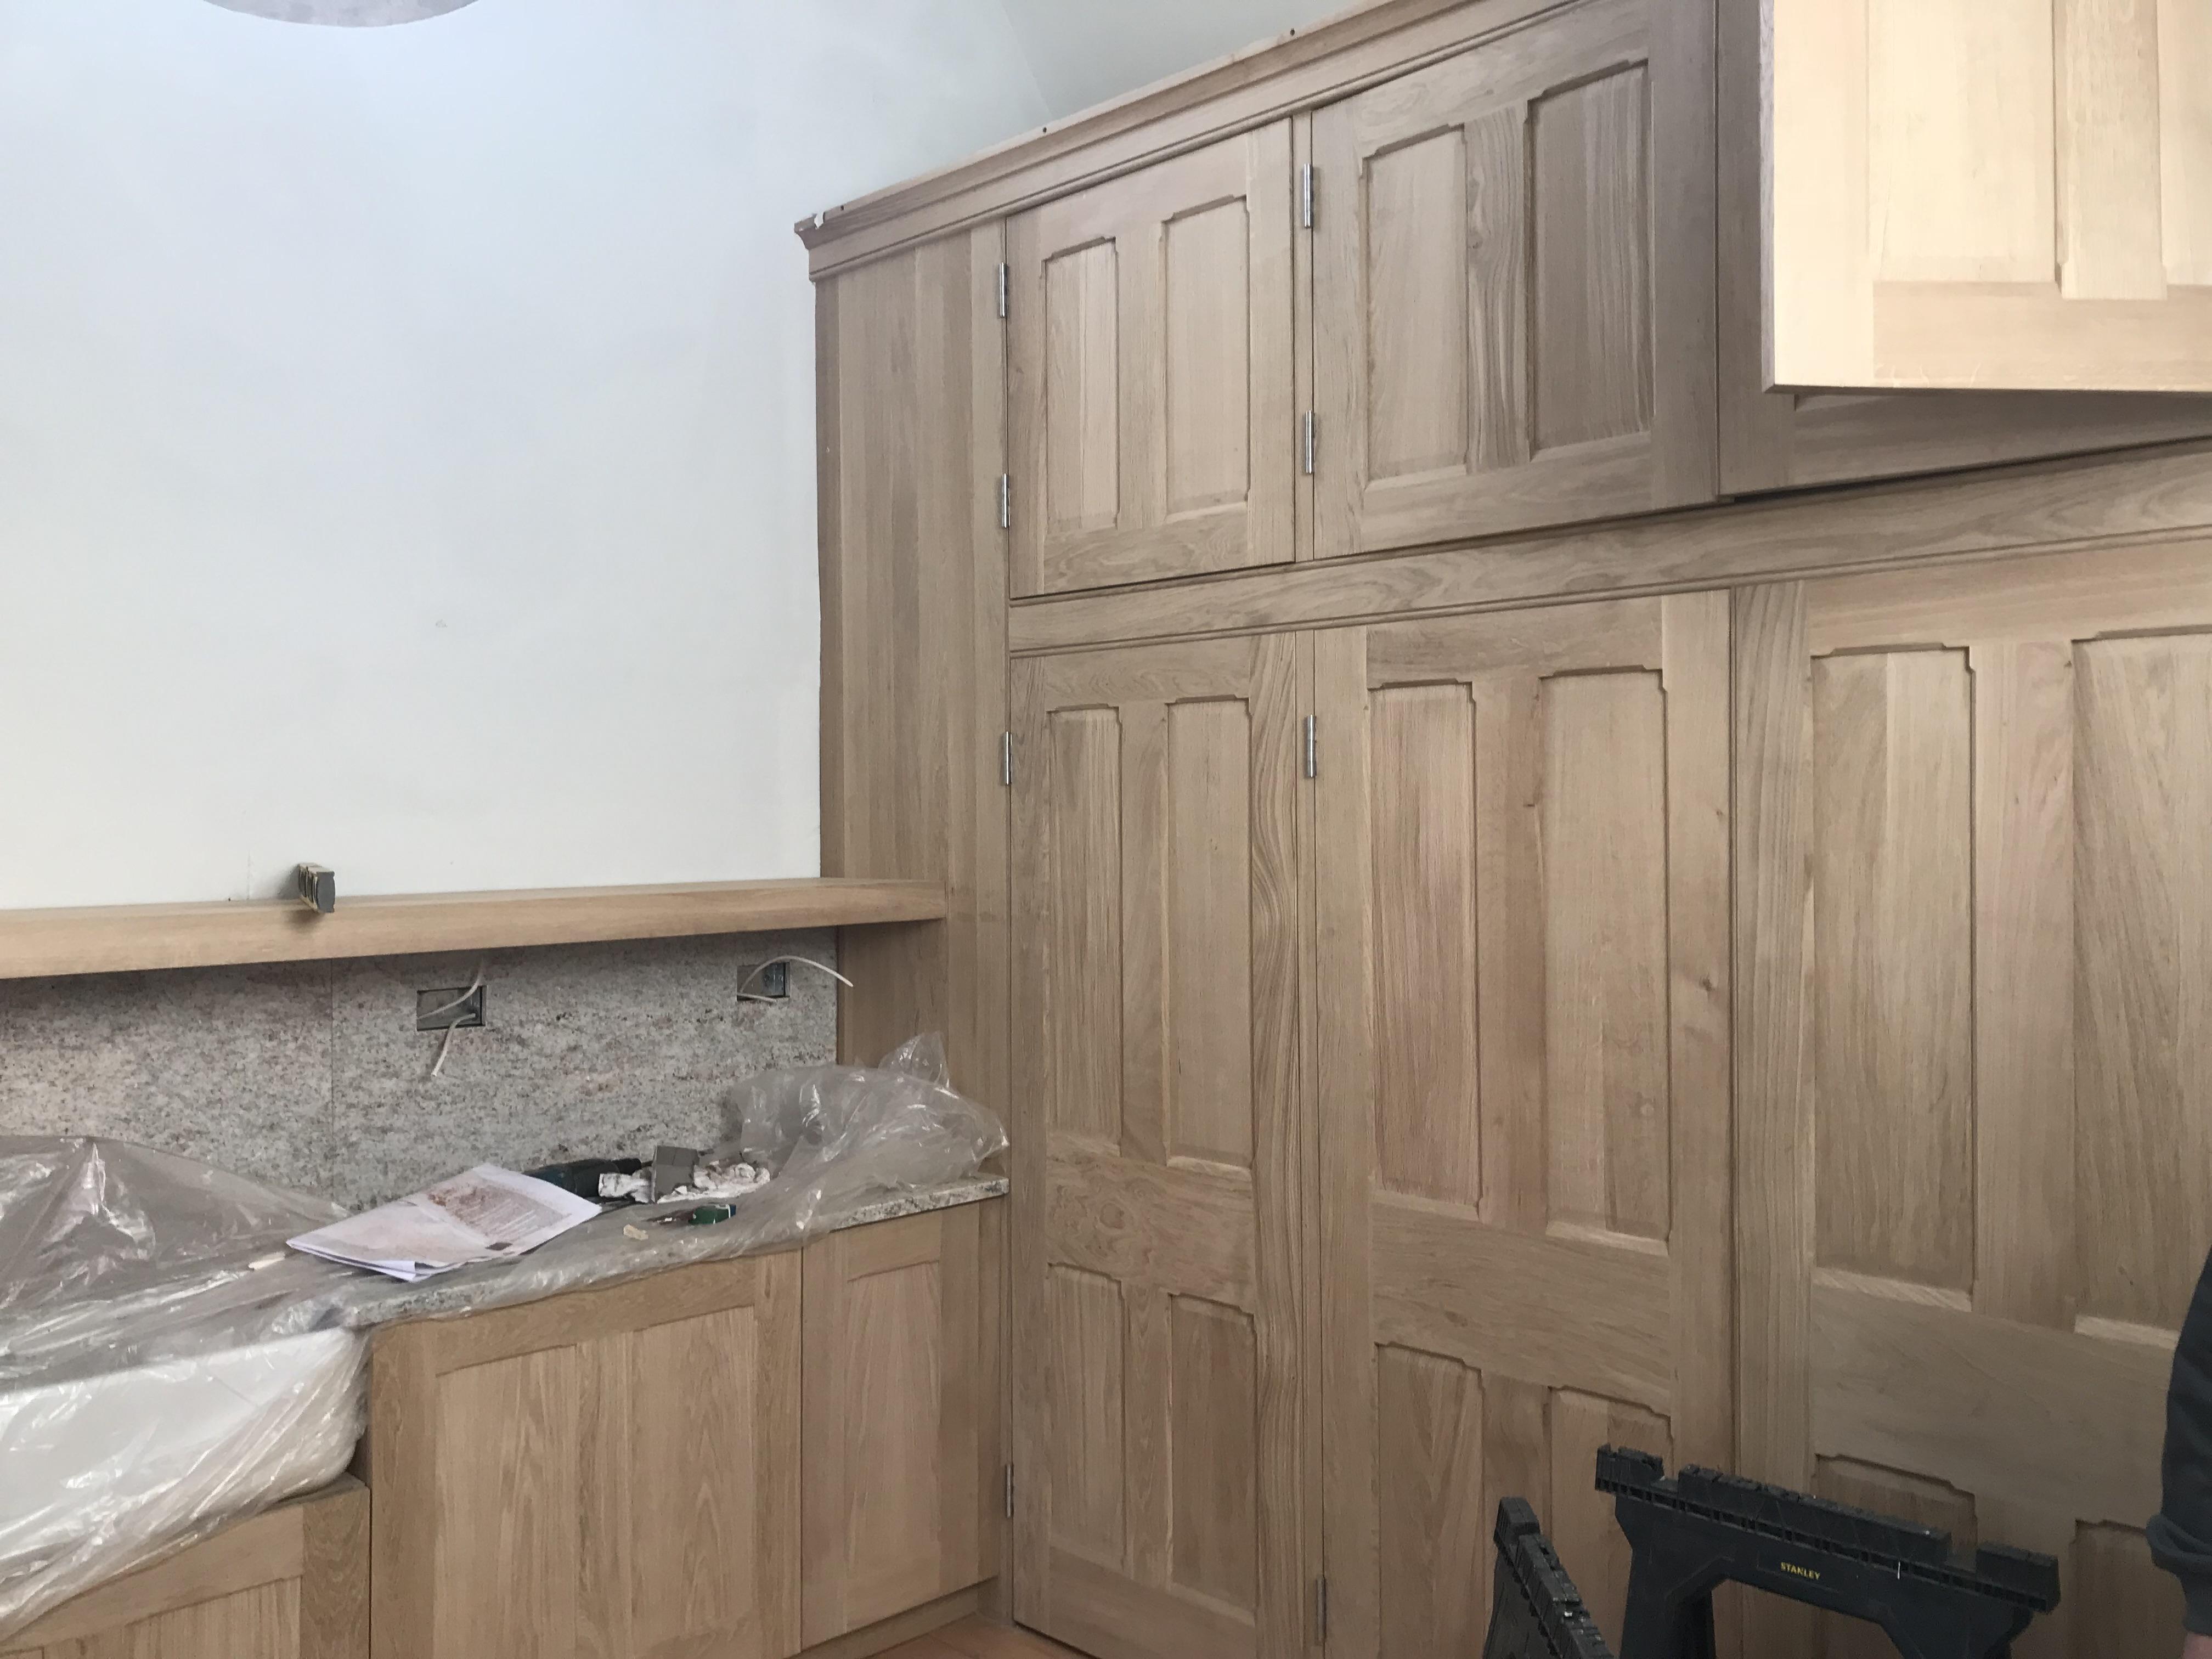 New sacristan's cupboards